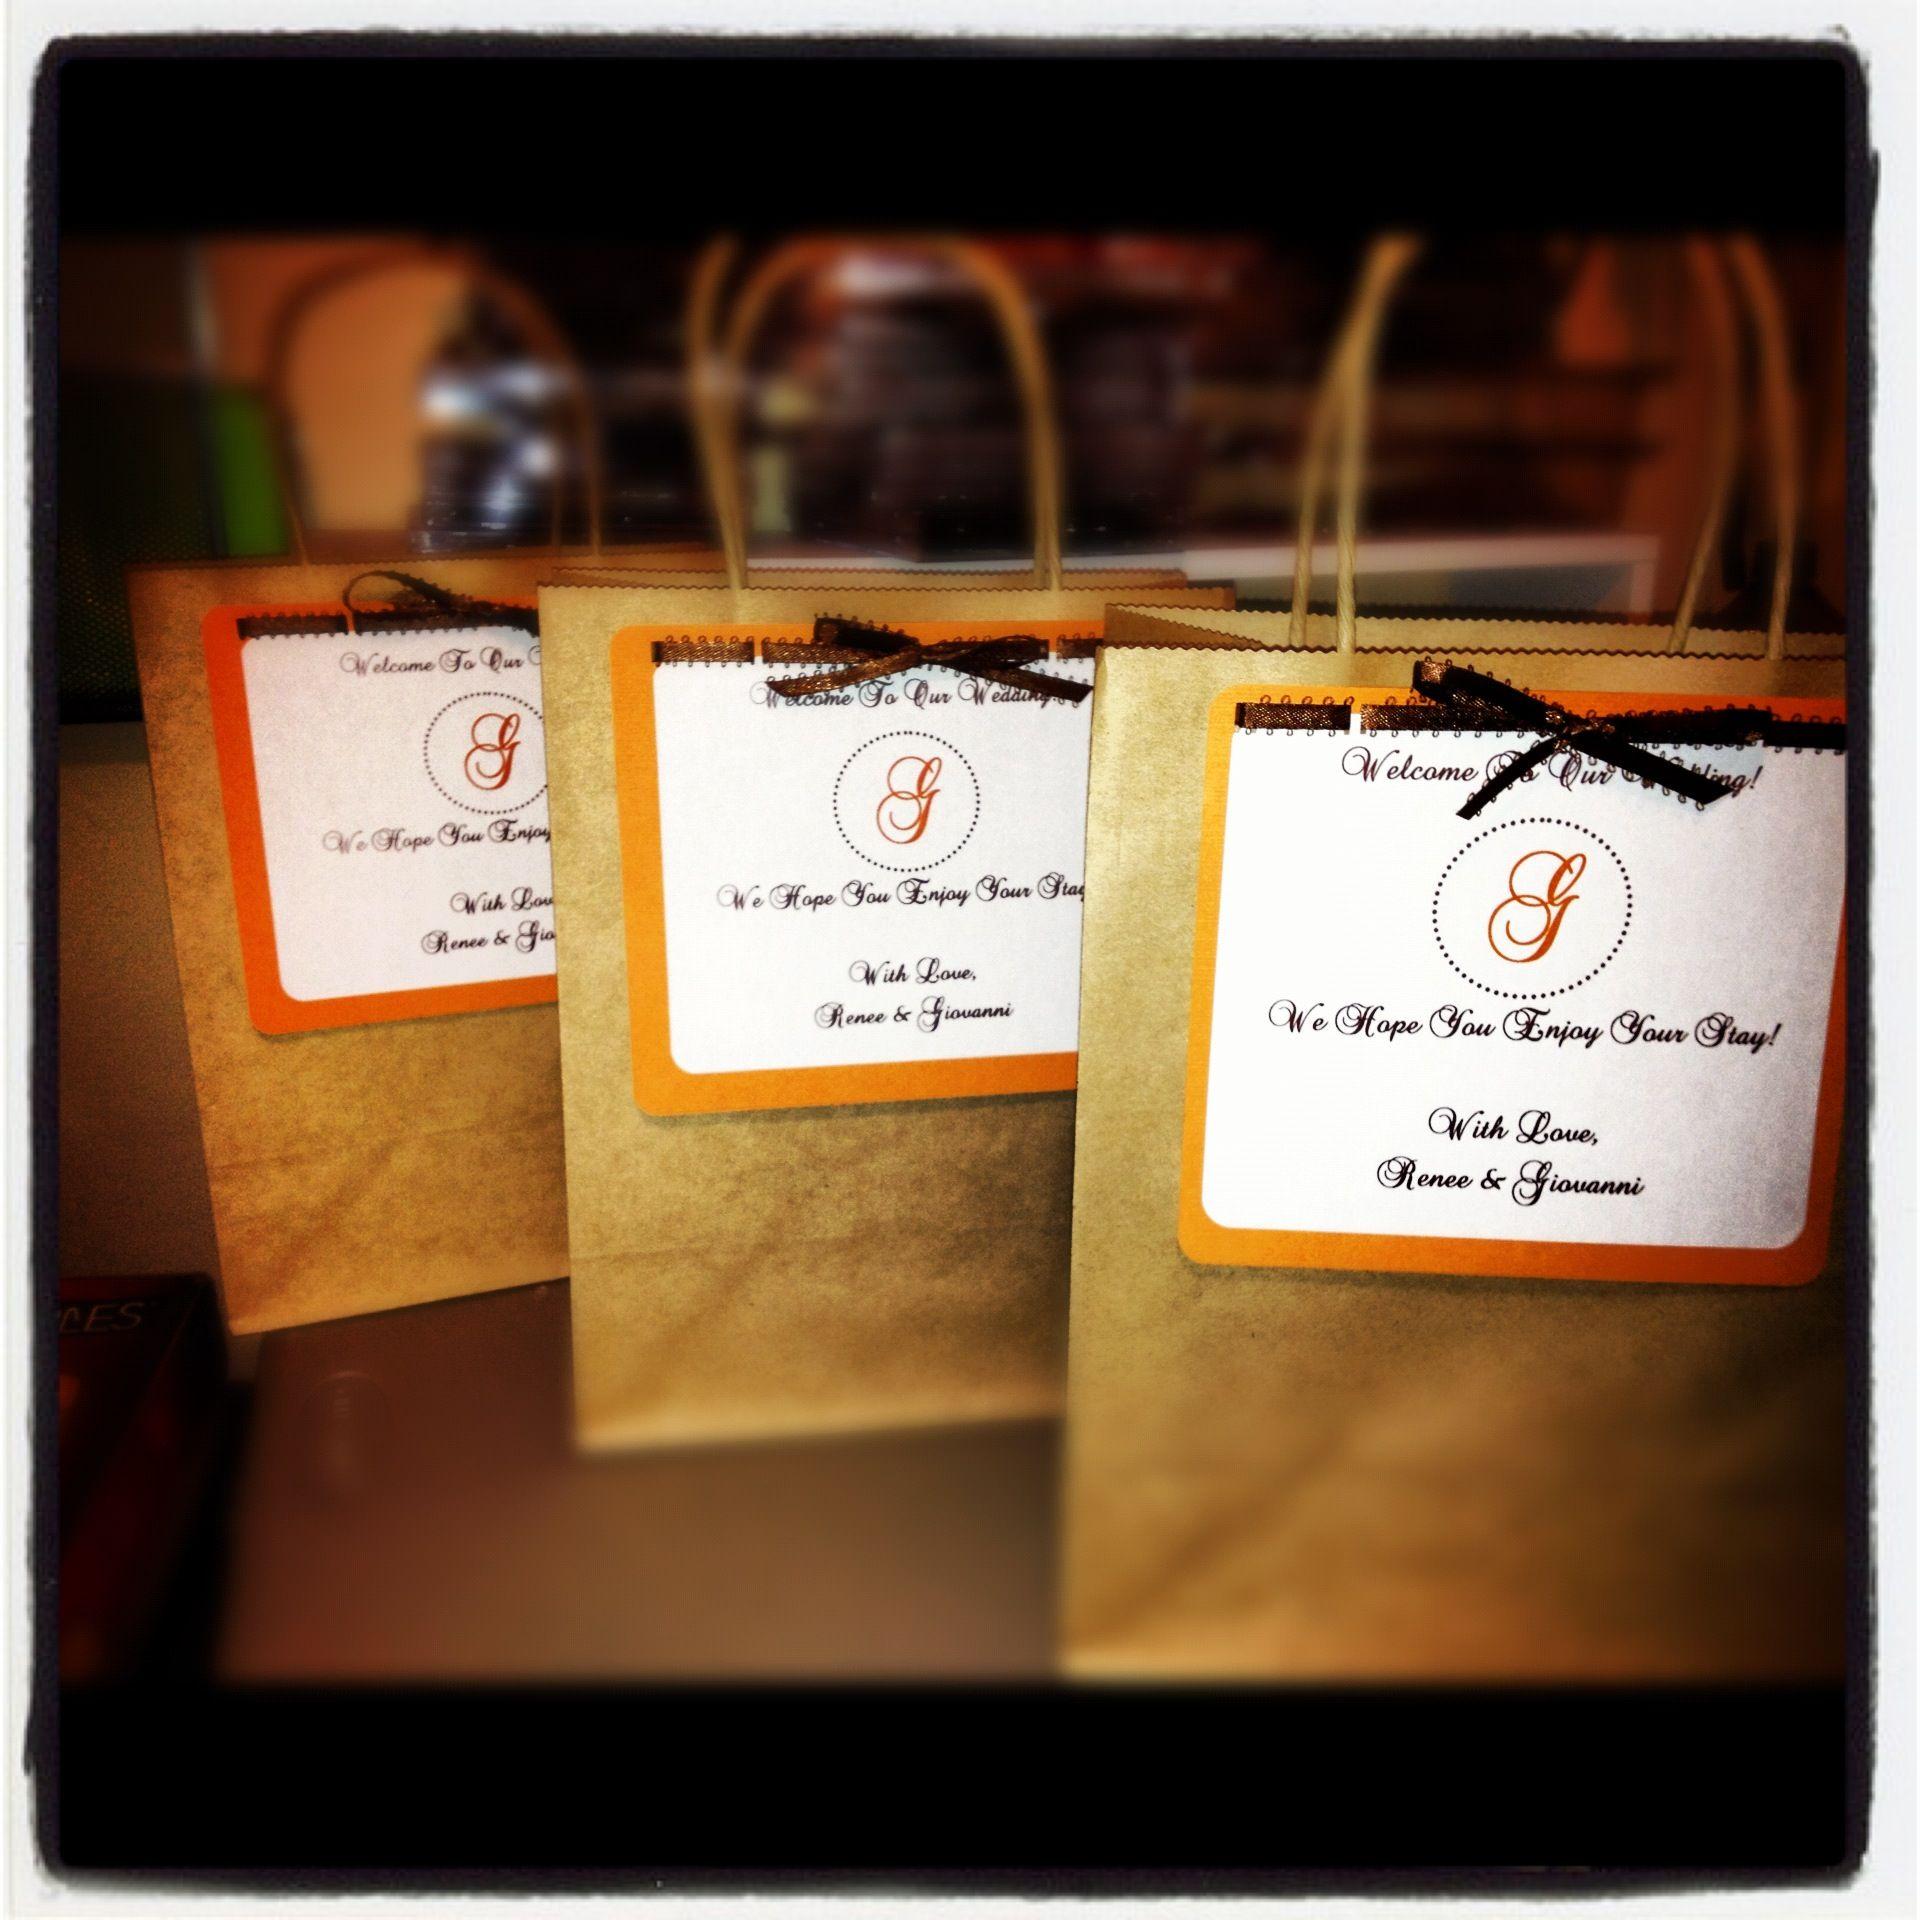 handmade wedding 'overnight' bags for guests... ShellieKCrafts design 2012